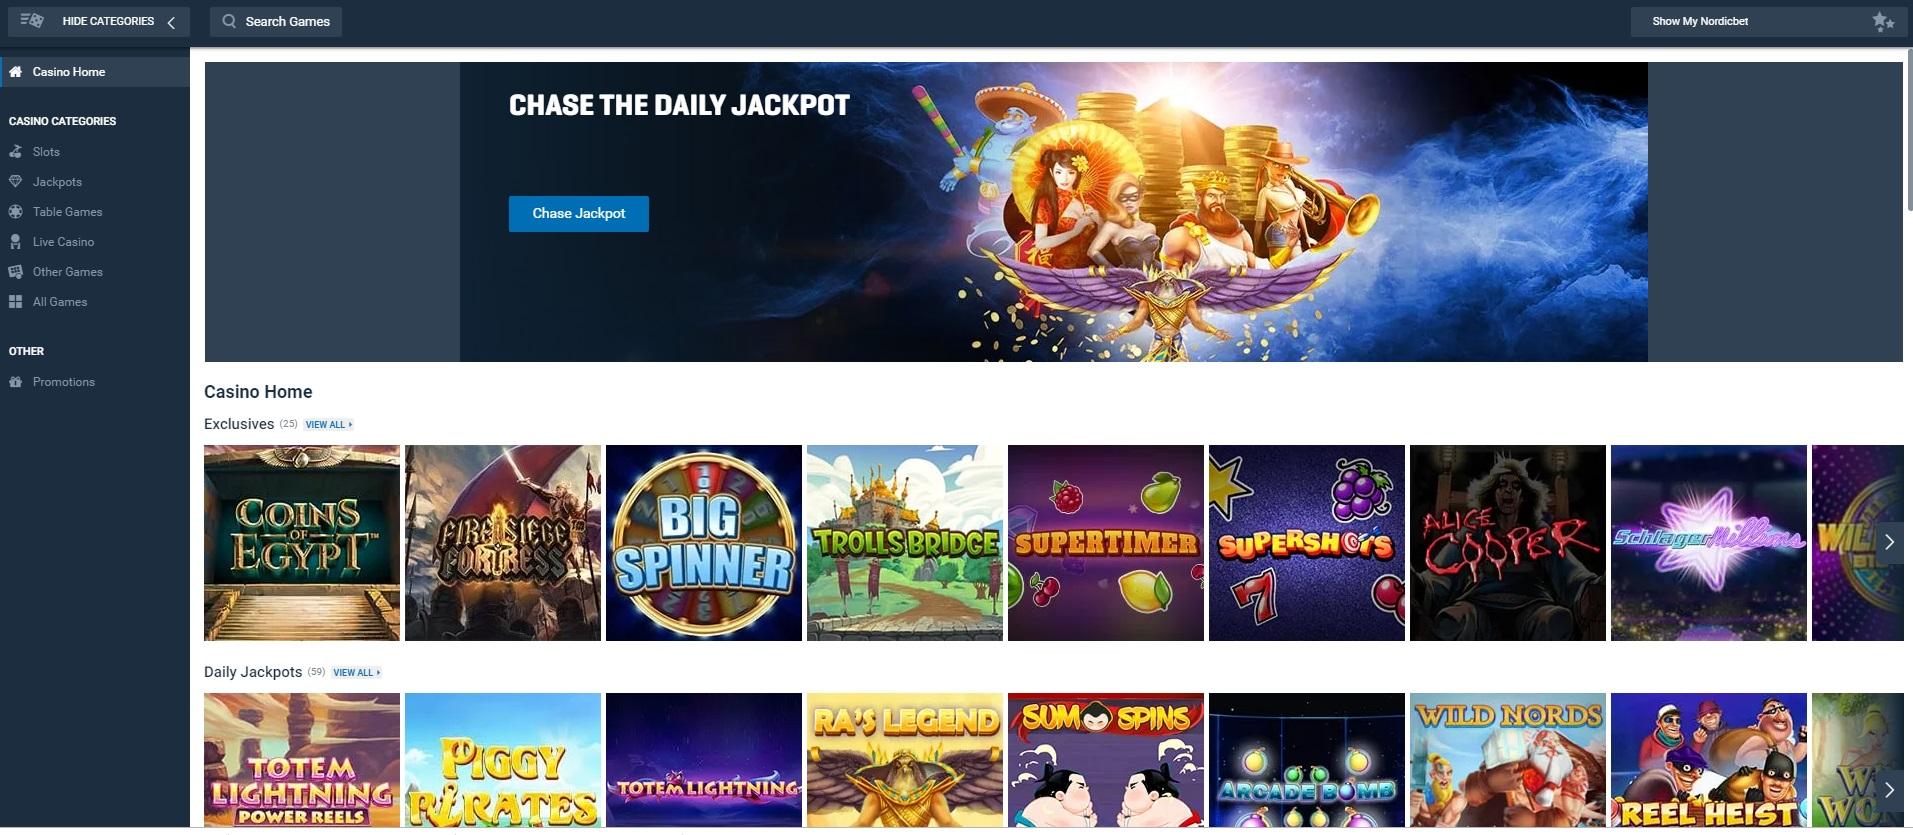 Nordicbet Casino Review At Slotmad Top Online Slots Bonuses